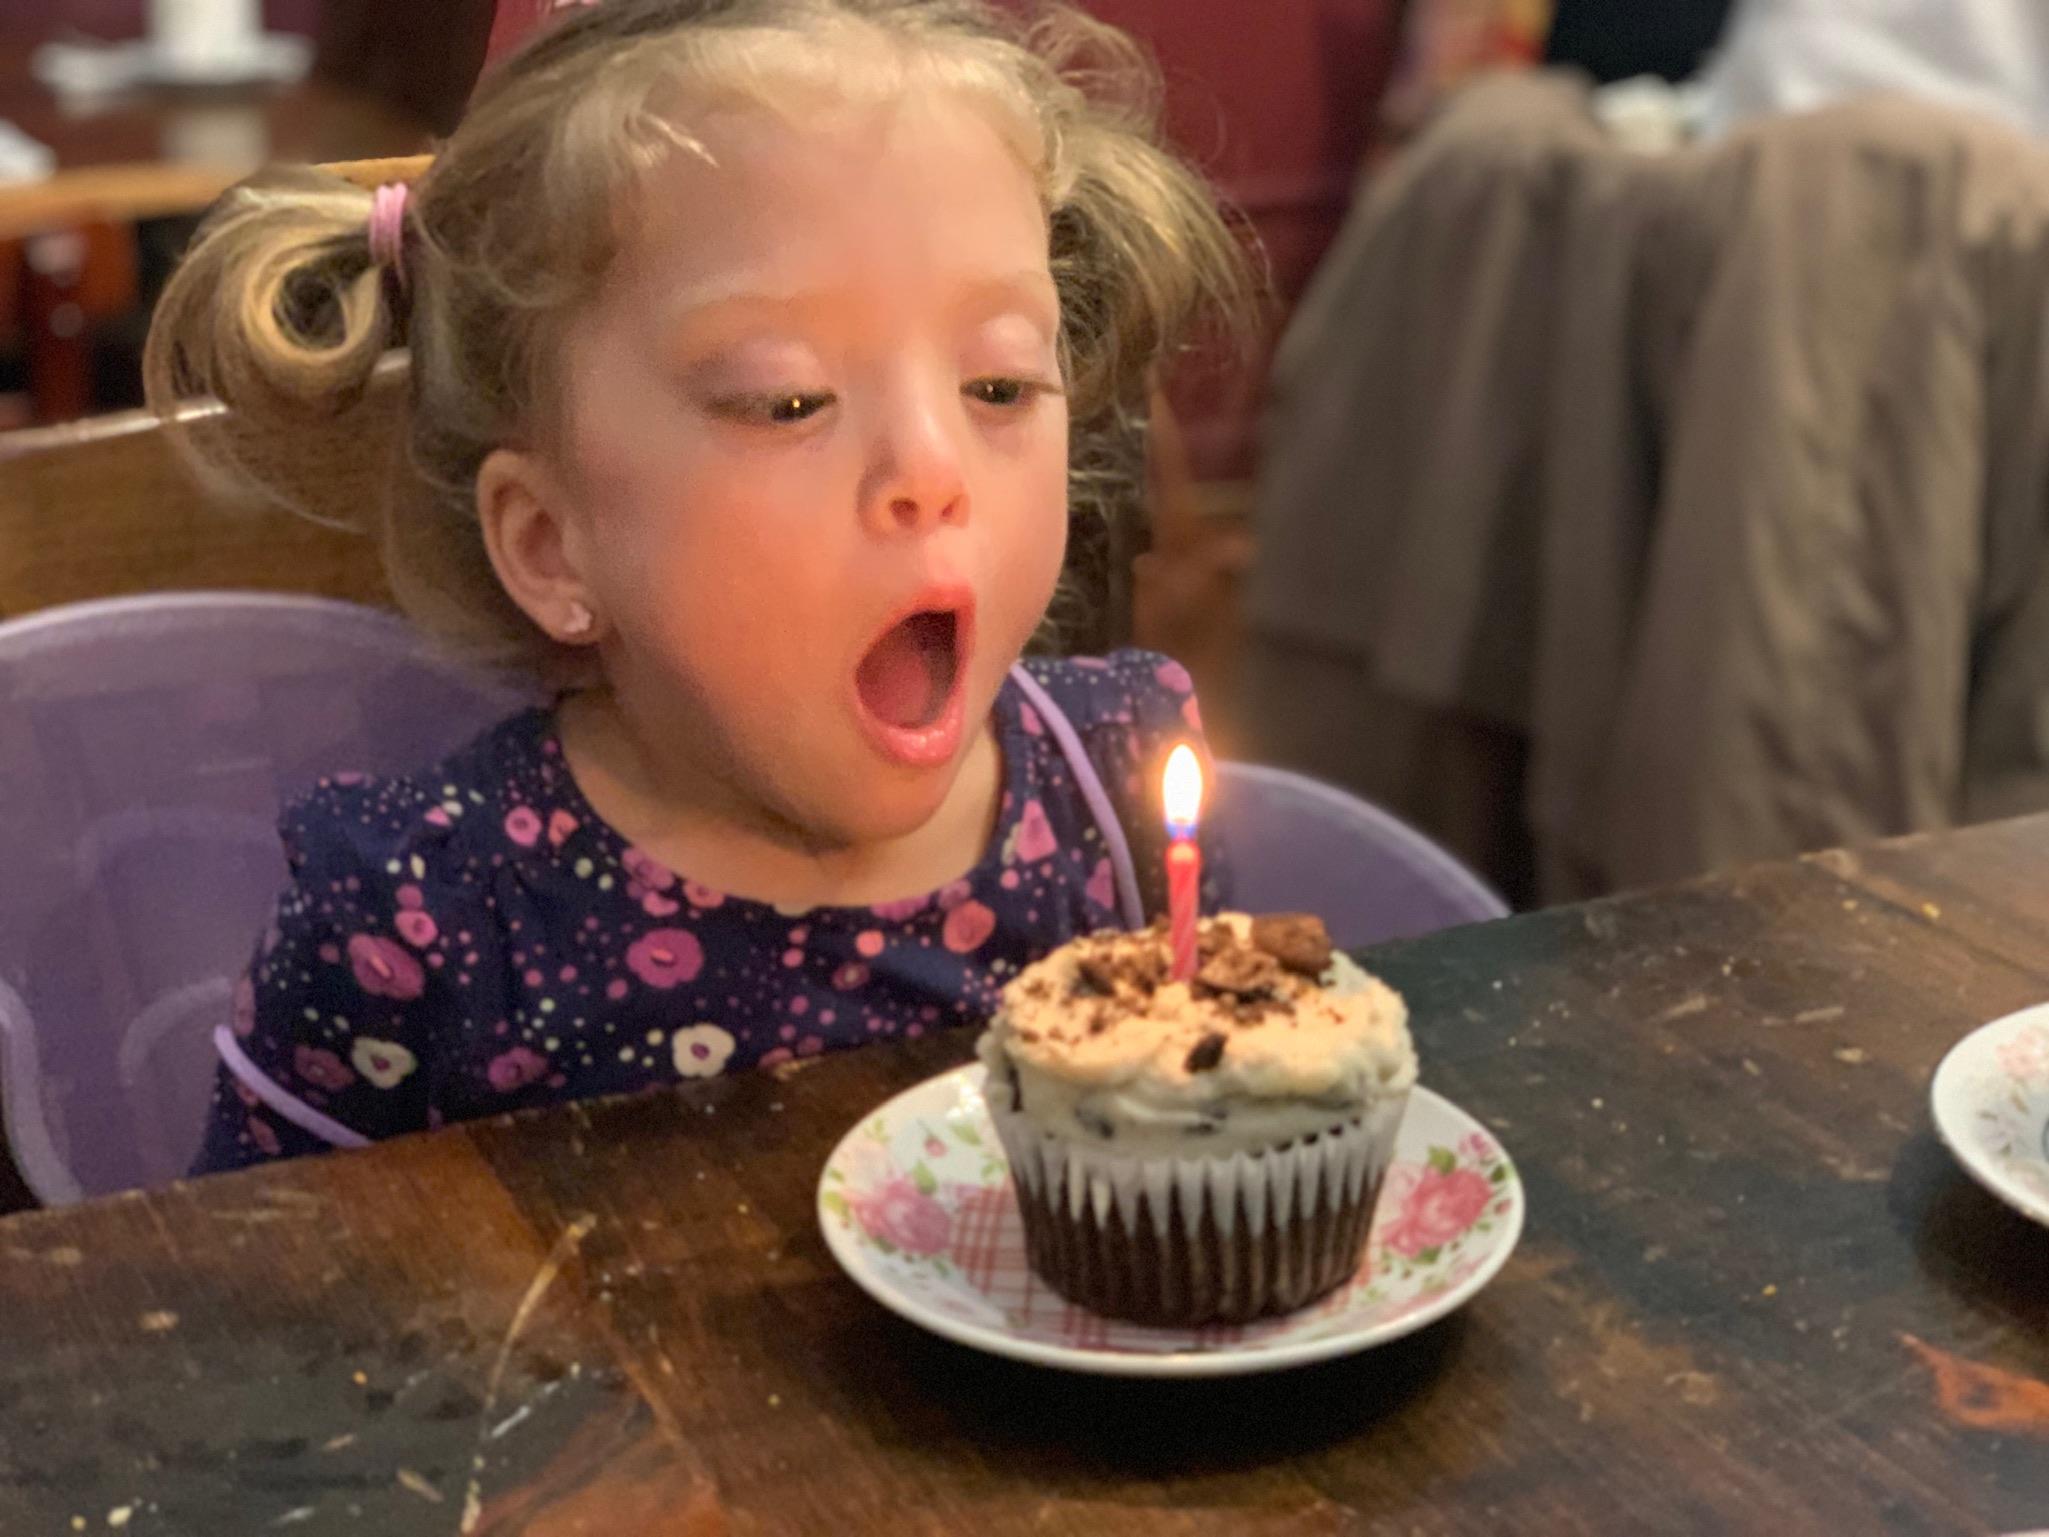 Happy Birthday, Lucie. We love you.